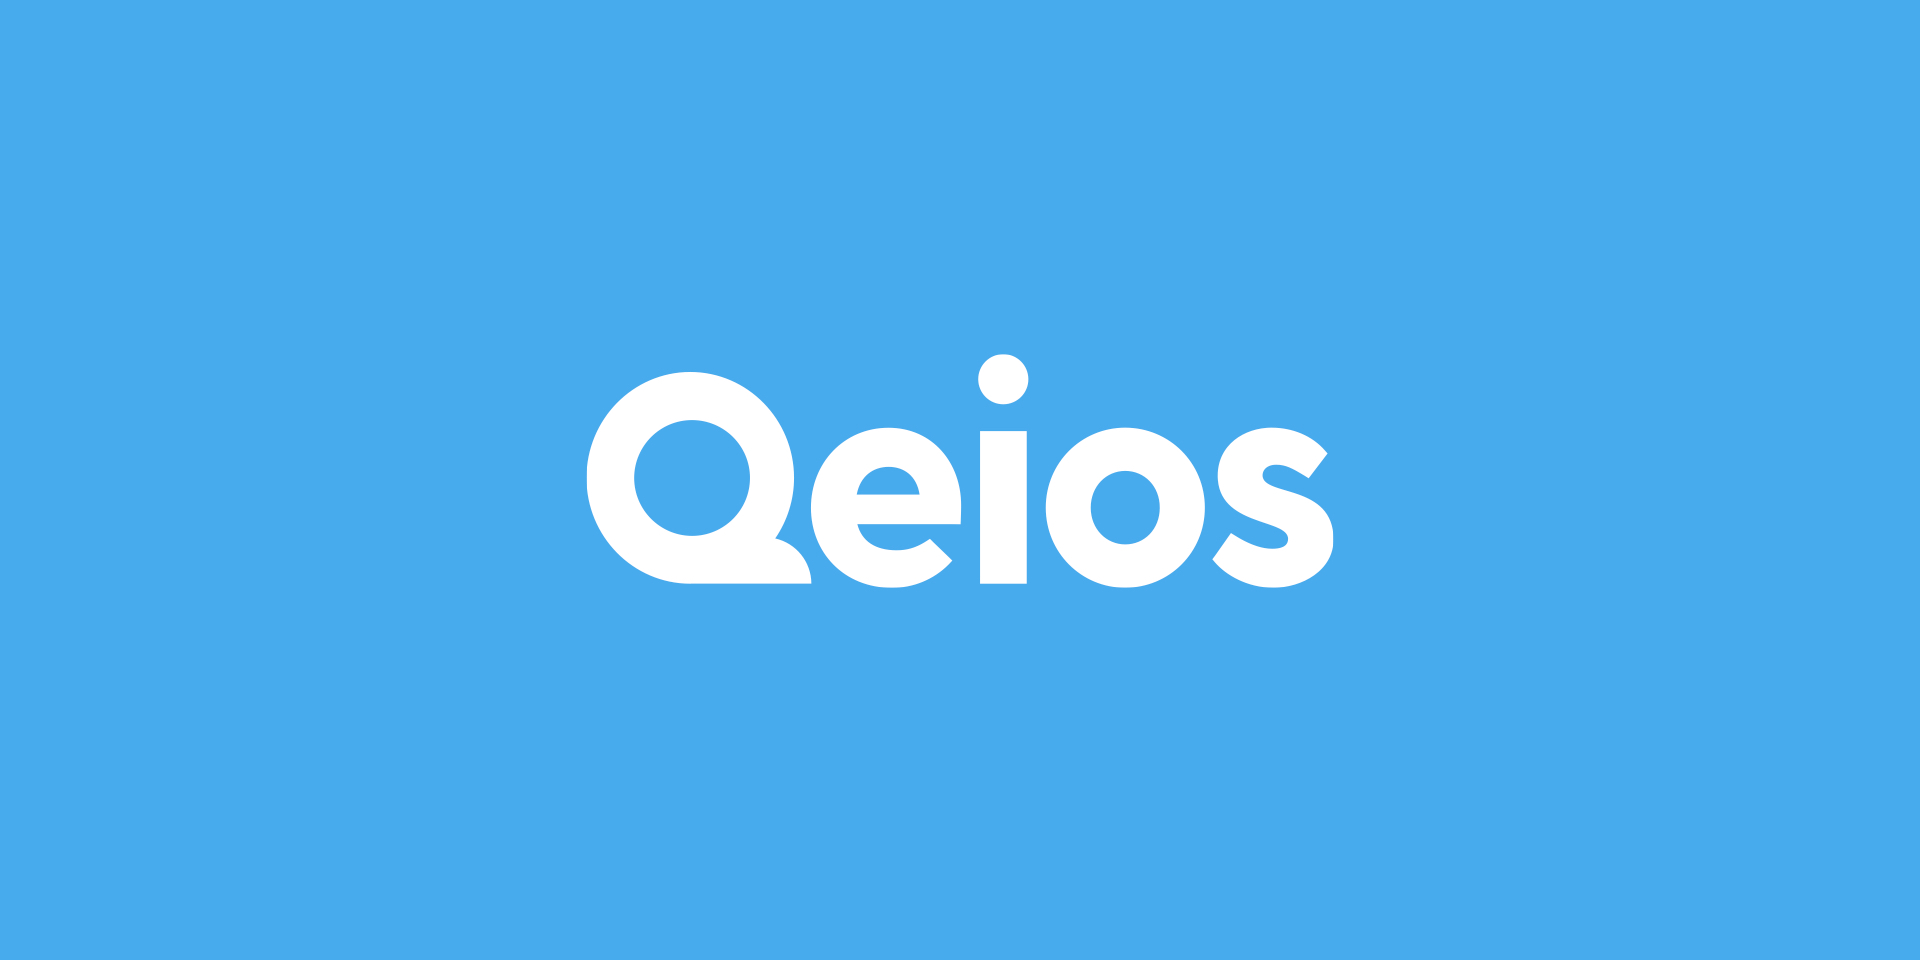 www.qeios.com